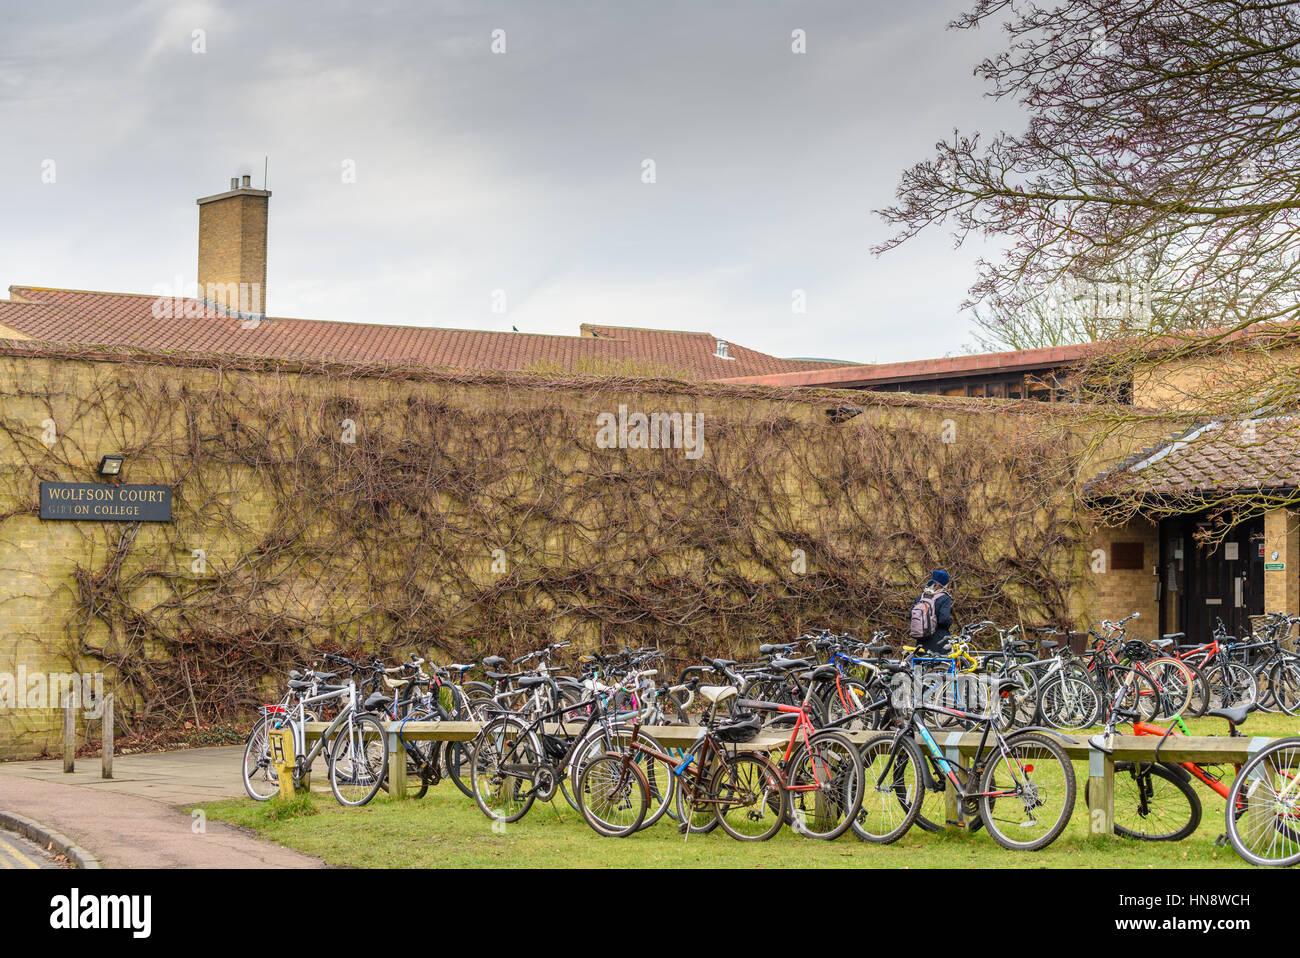 Girton college at the University of Cambridge, England. - Stock Image